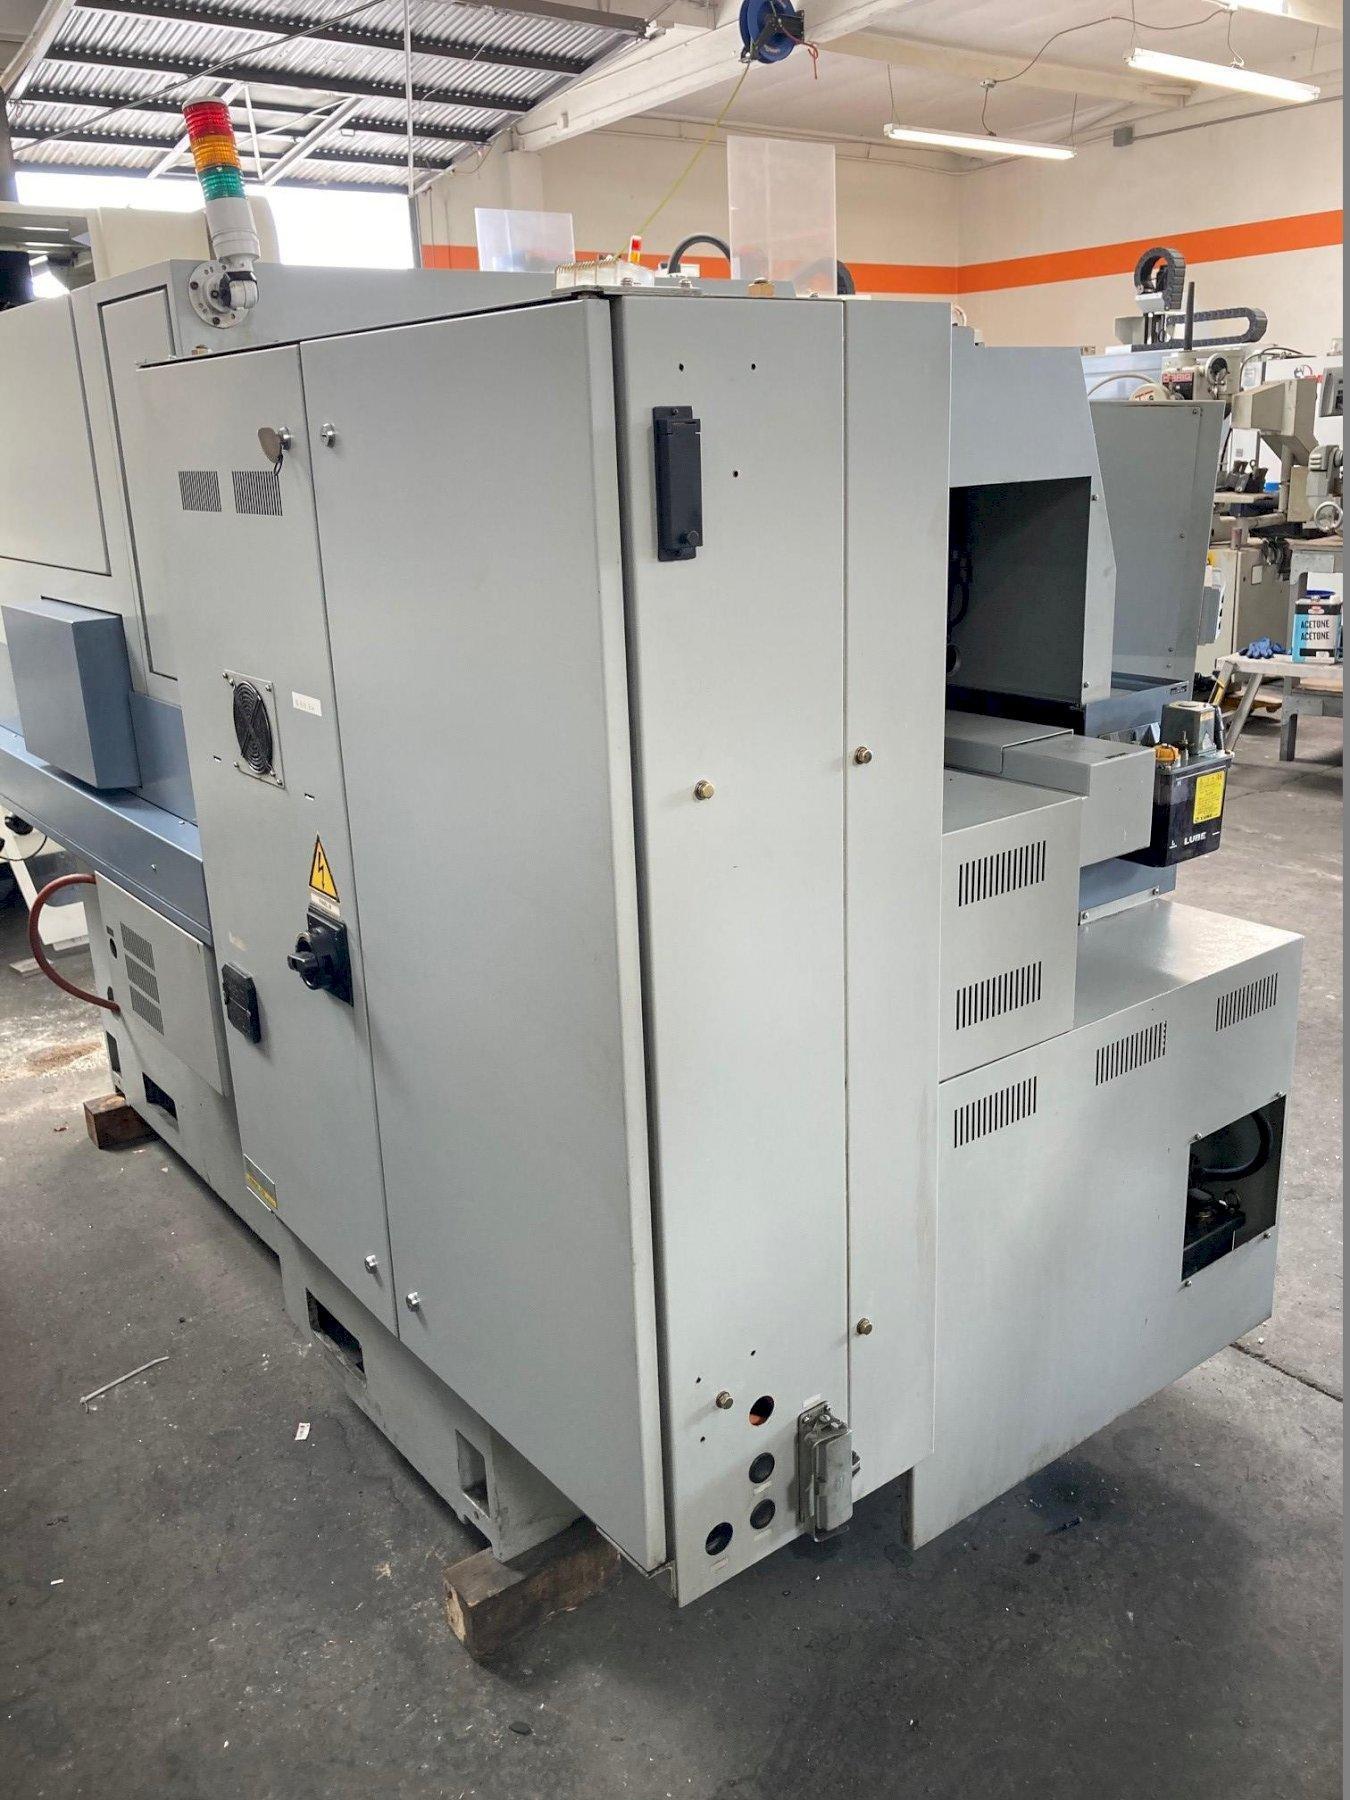 Star SV-32 CNC Swiss Lathe with: Fanuc 16i-T CNC Control, LNS Hydrobar Mini Sprint Bar Feeder, Tooling, and Parts Catcher.